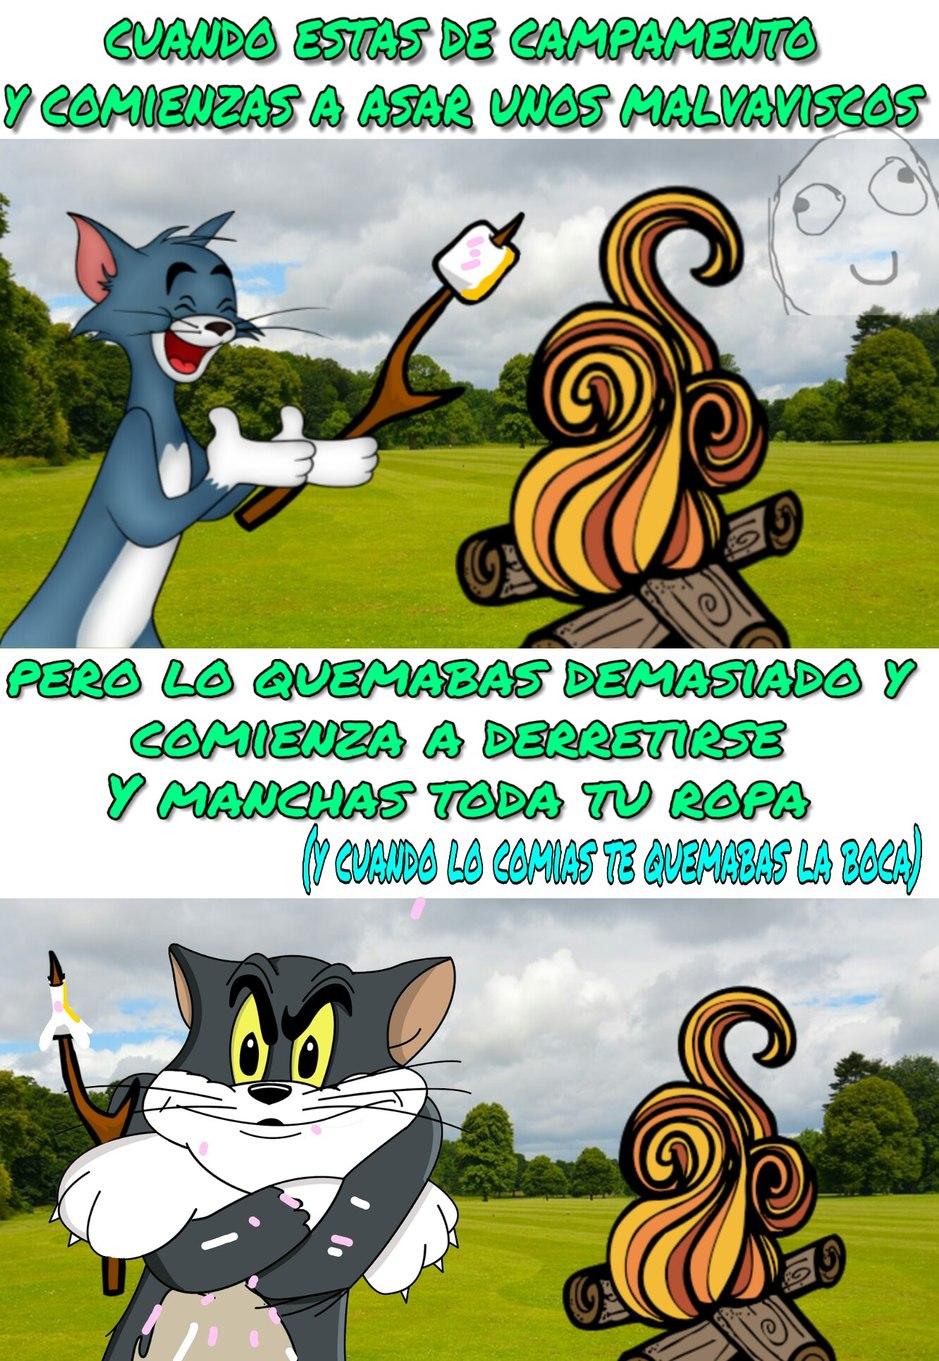 Top memes de campamento en español :) Memedroid